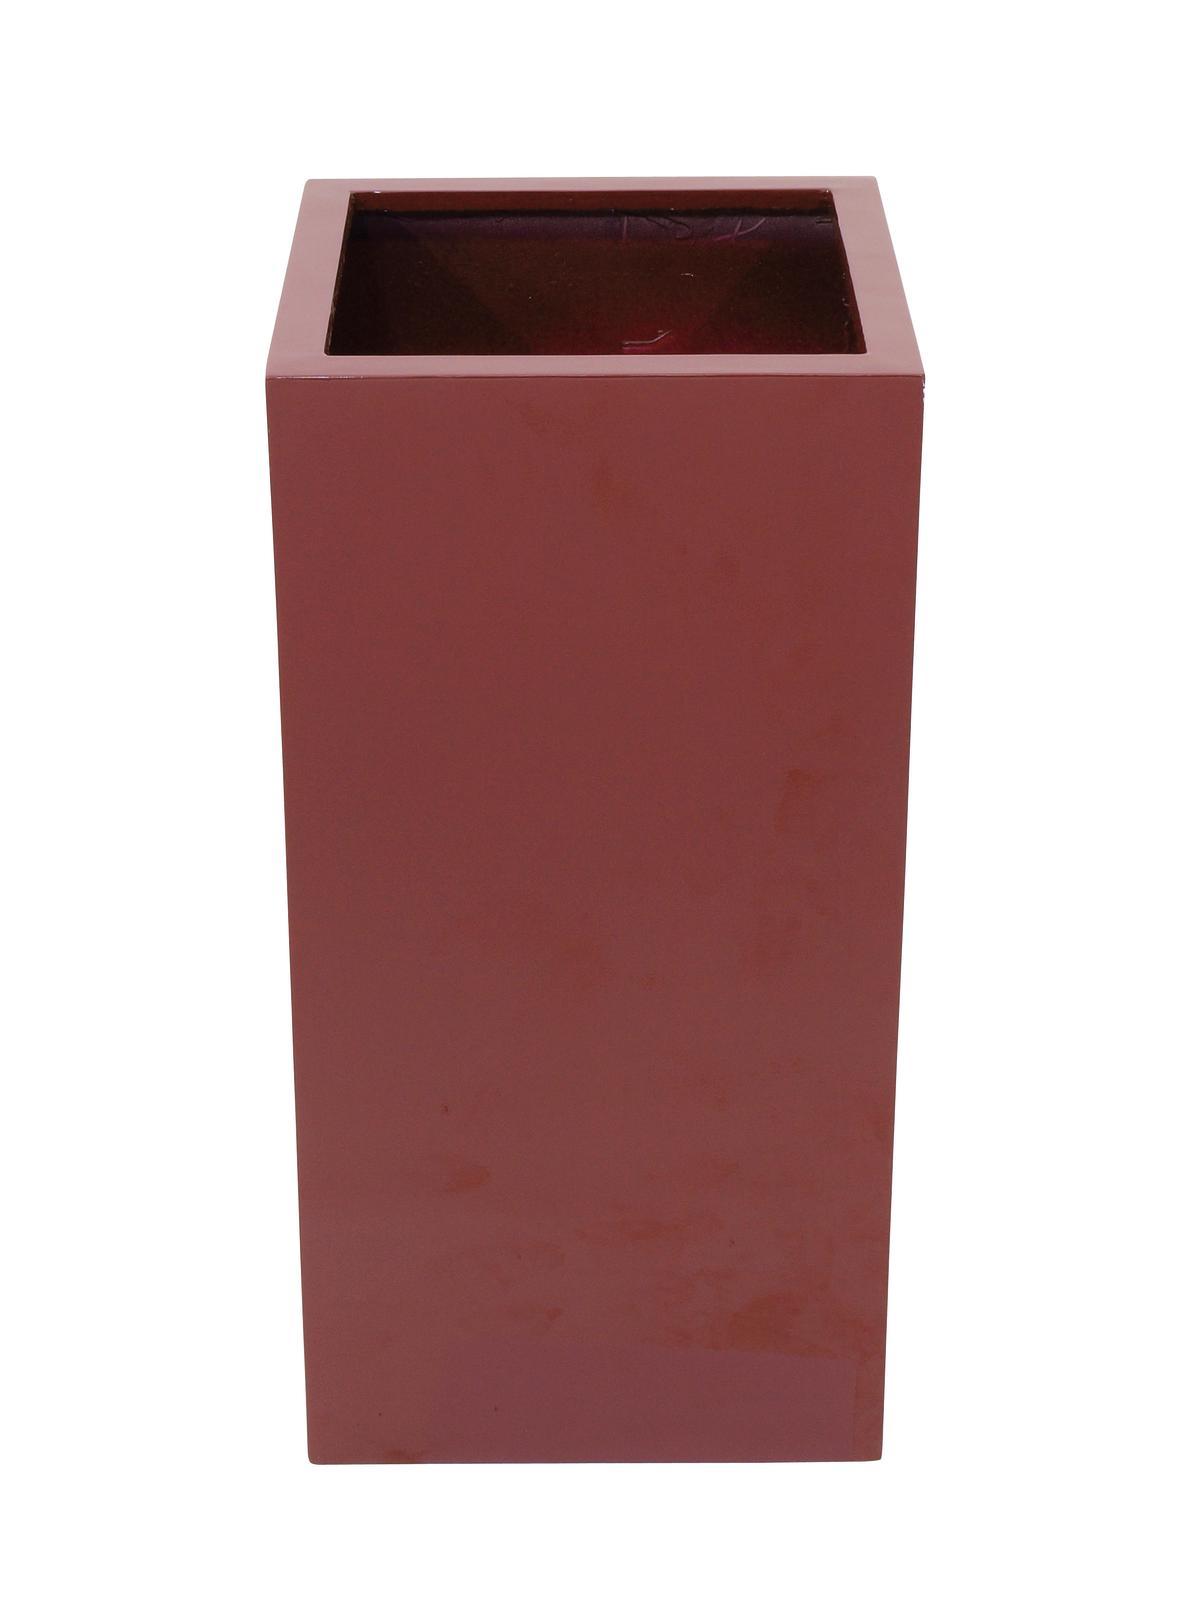 EUROPALMS LEICHTSIN BOX-80, lucido-rosso